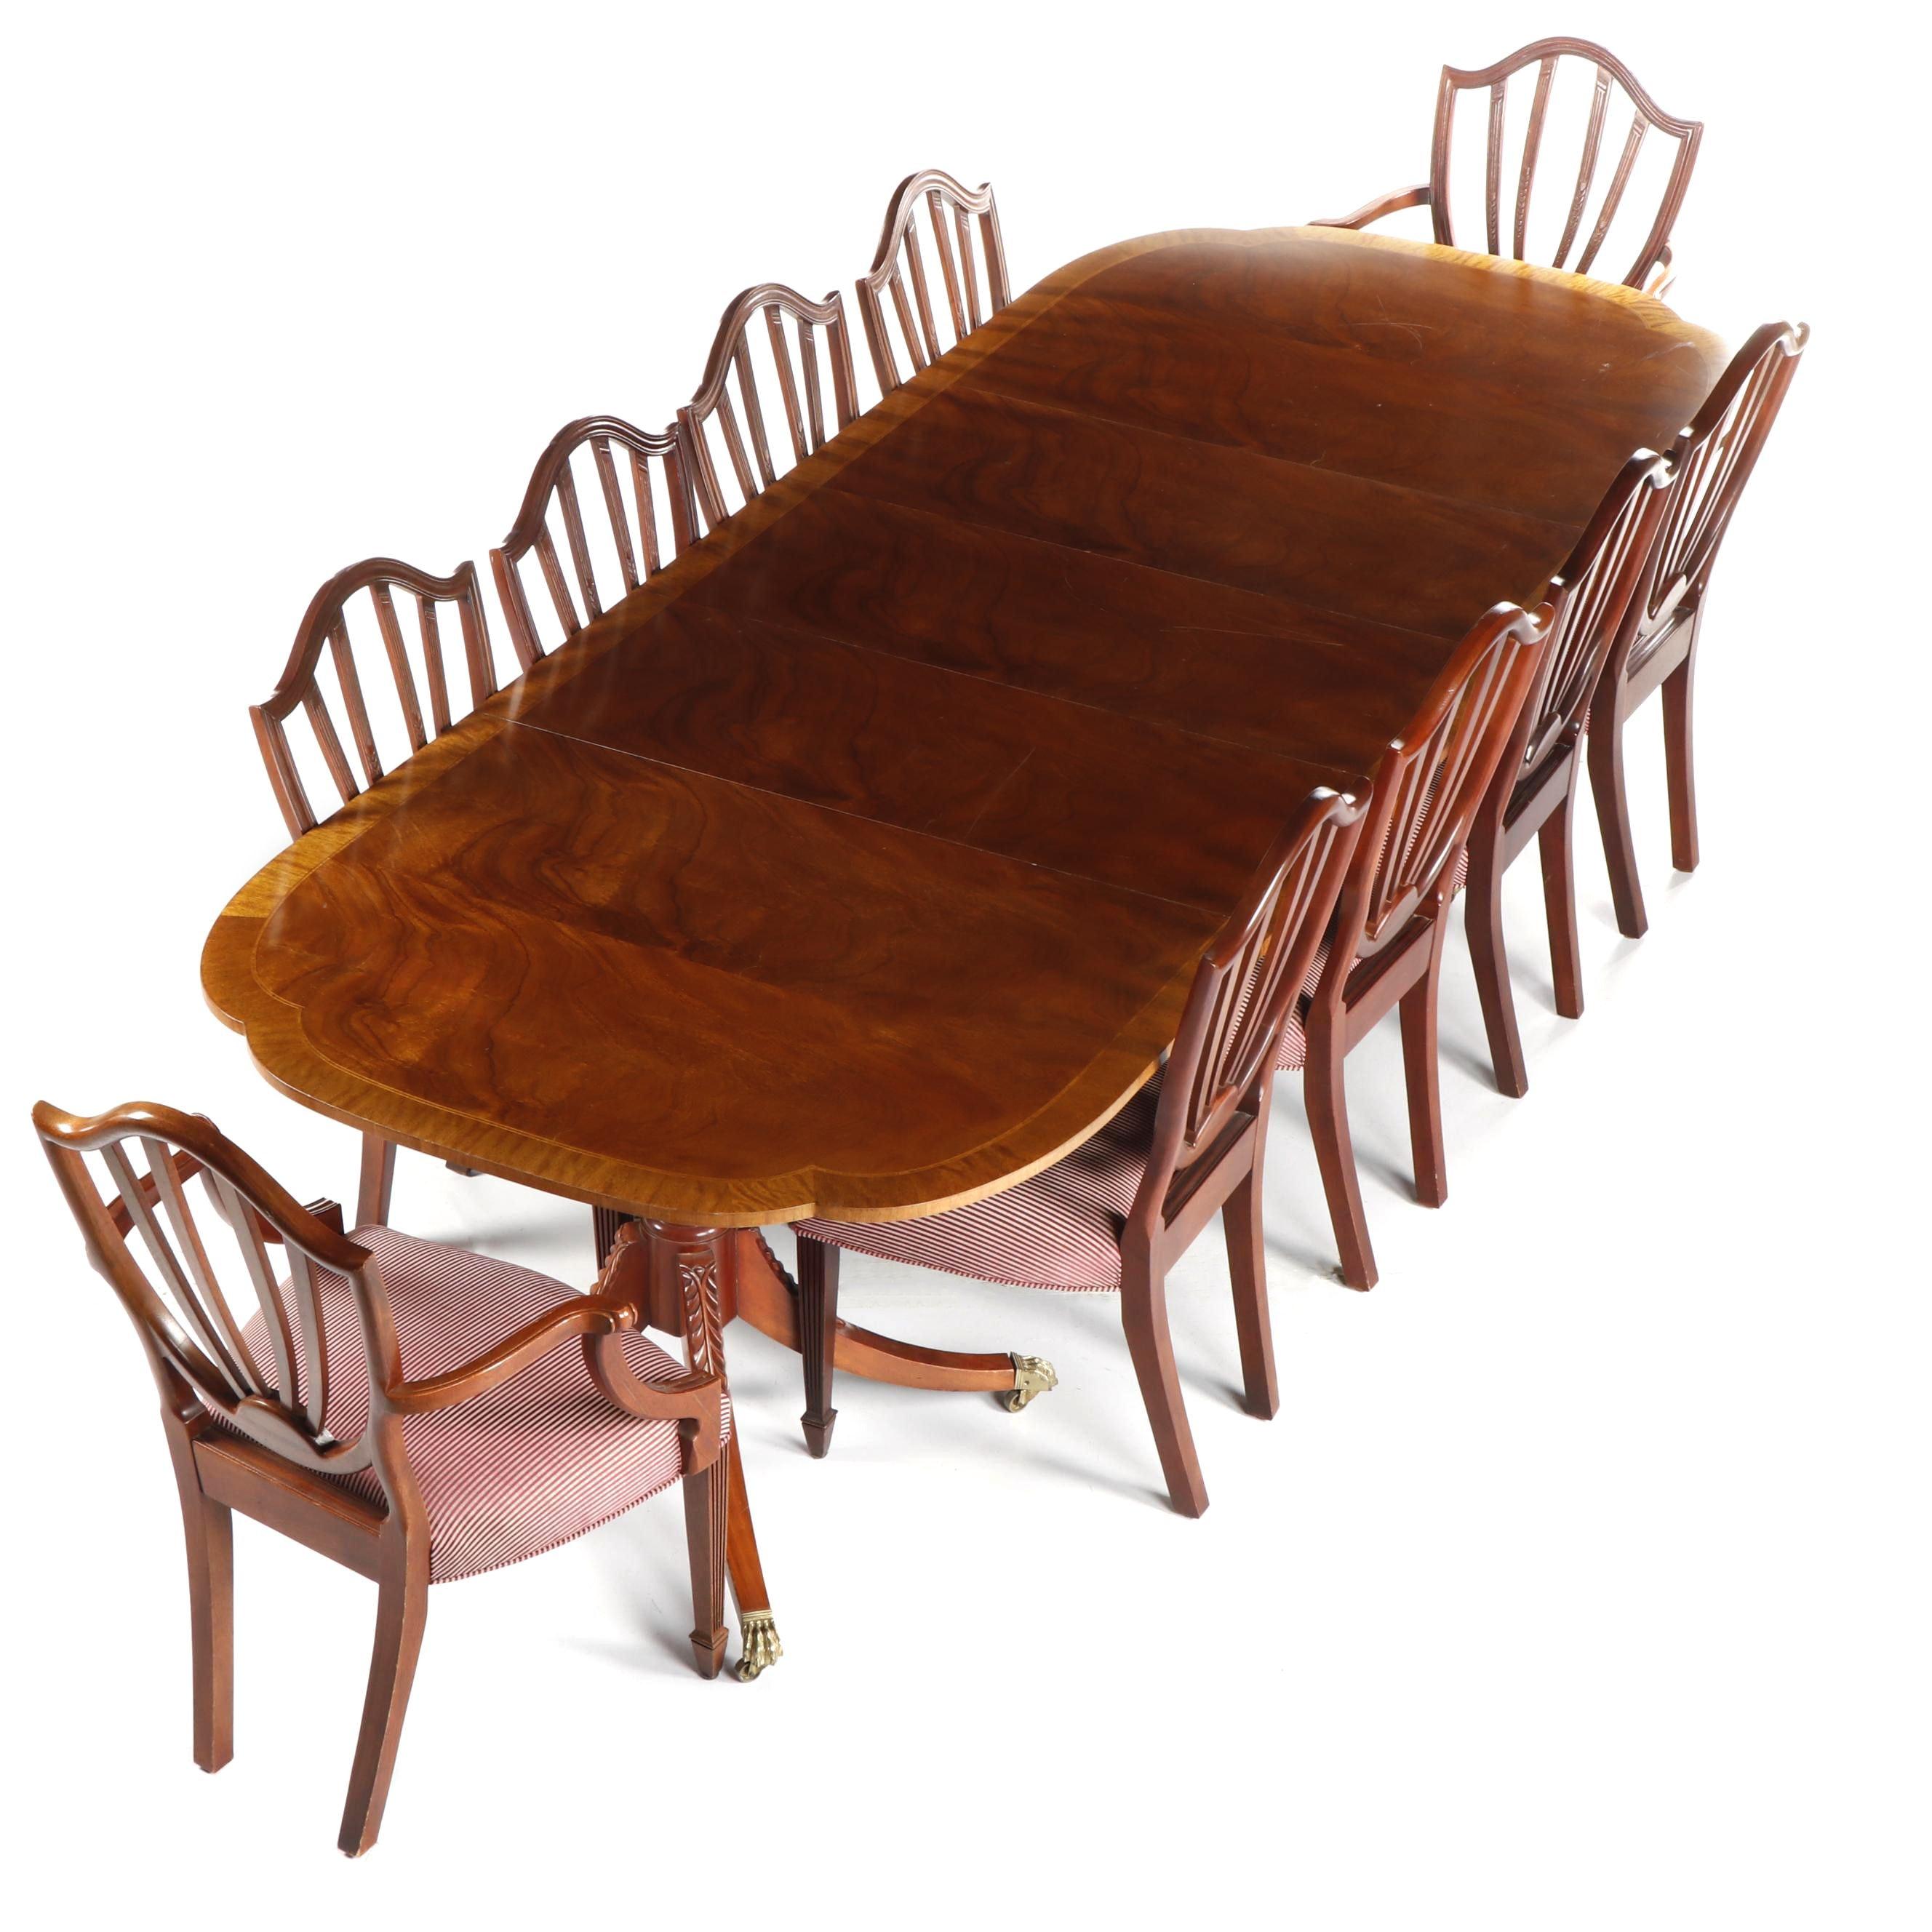 Baker Historic Charleston Mahogany Table & Baker Hepplewhite Style Chairs